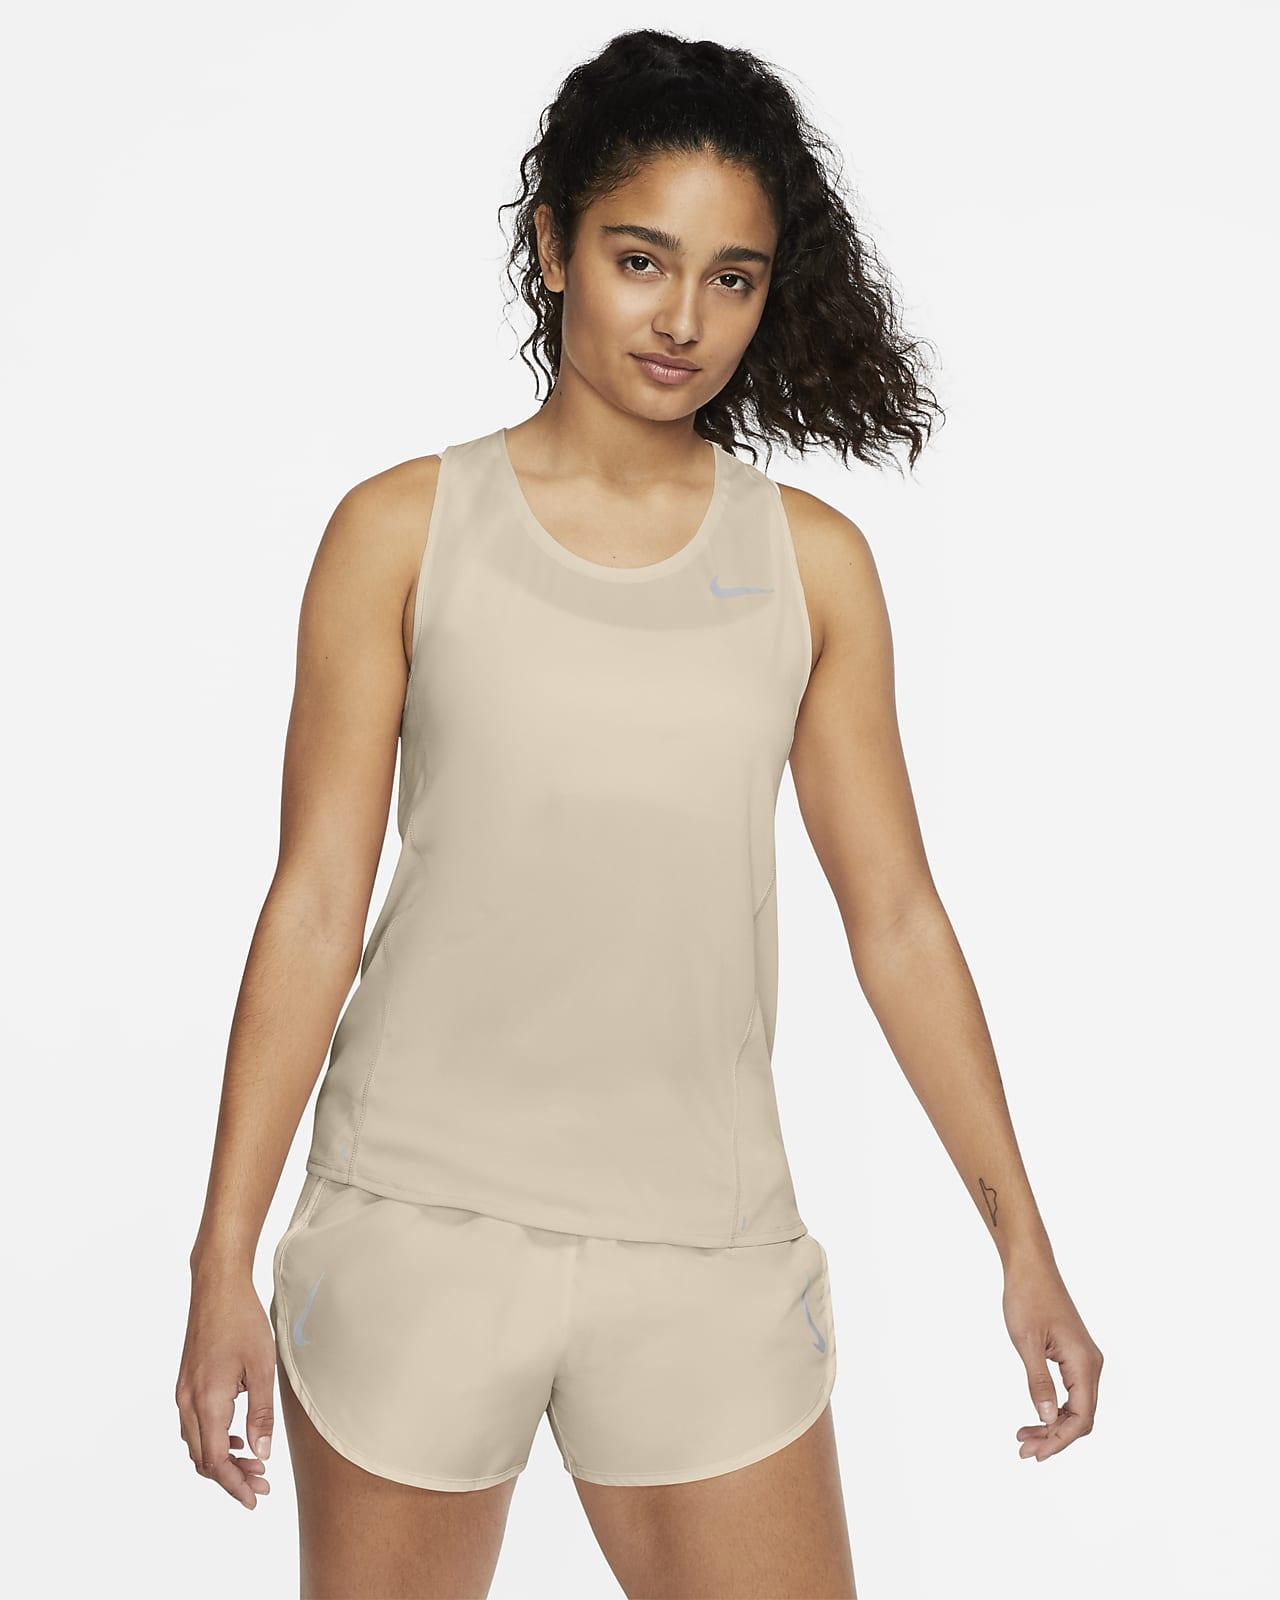 Nike Women's Running Tank. Nike.com